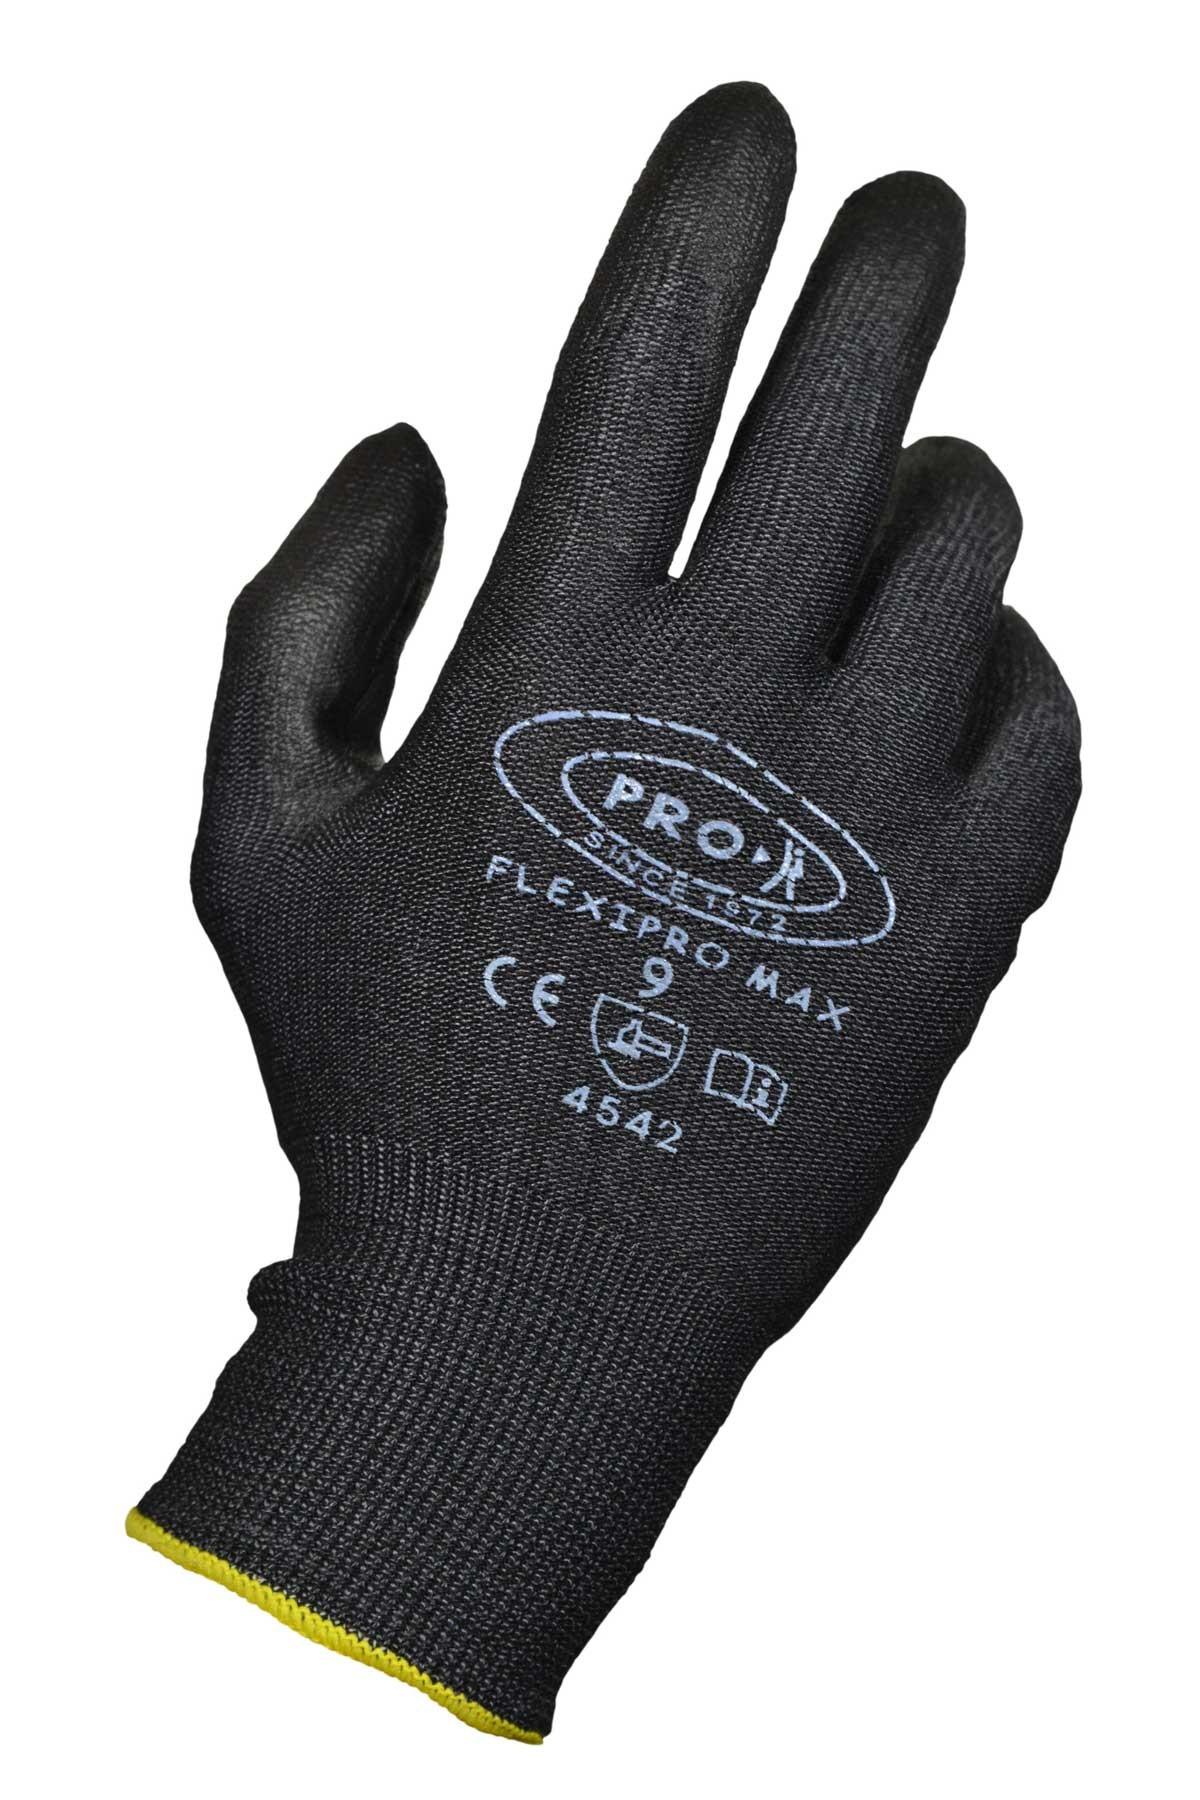 gants anti coupure flexipro max. Black Bedroom Furniture Sets. Home Design Ideas